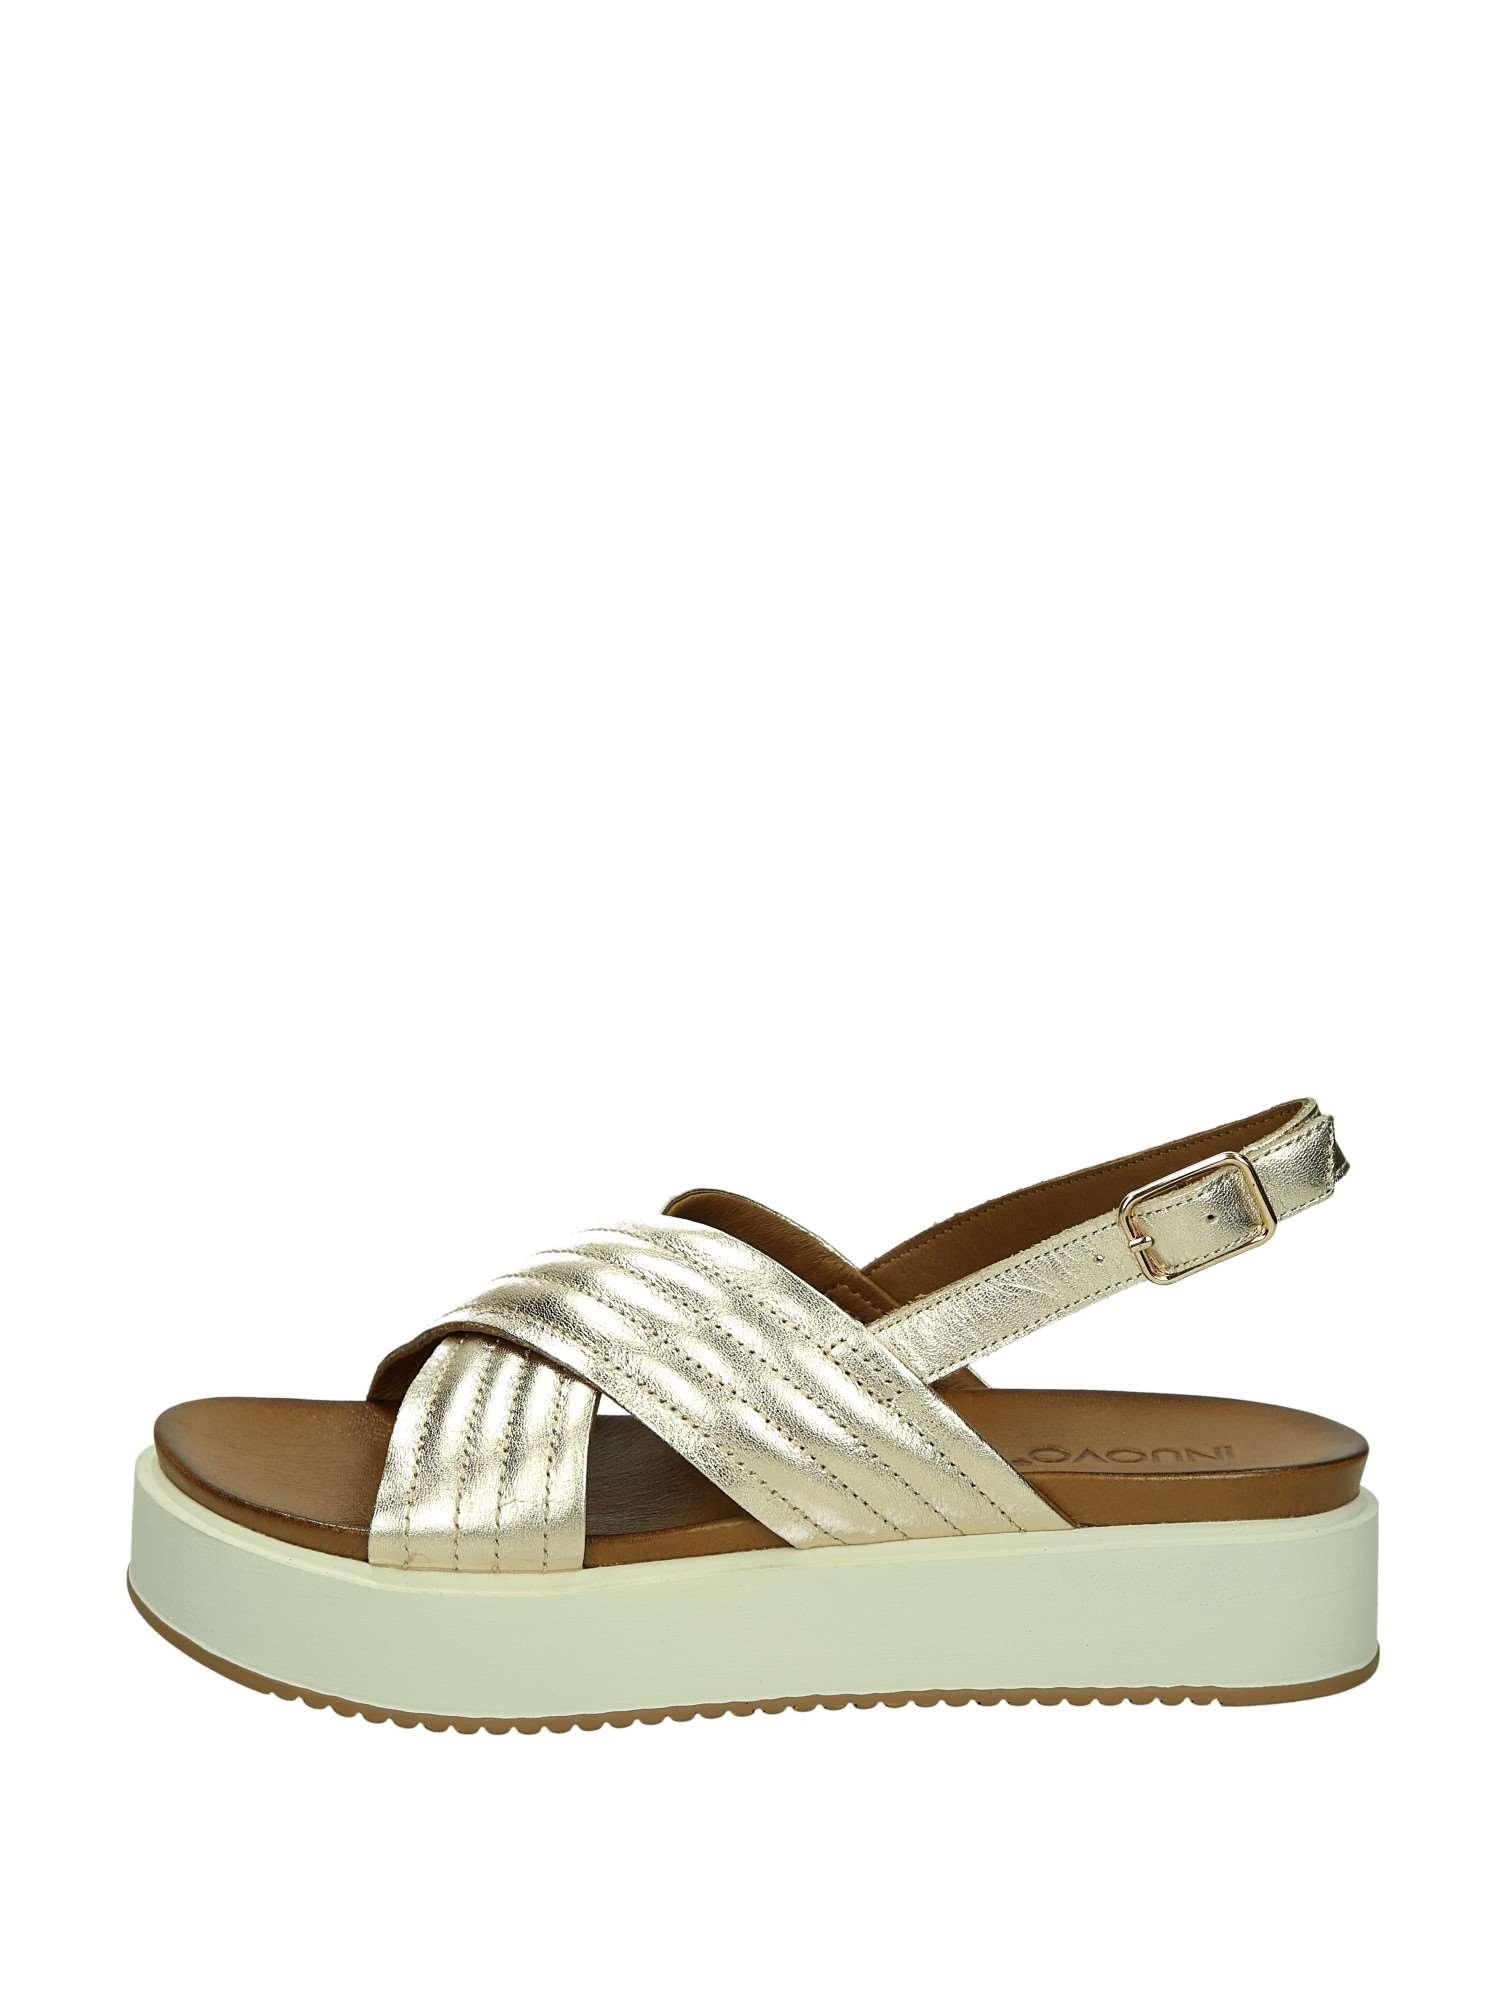 Sandali bianchi con allacciatura elasticizzata per unisex YDLZ2YT